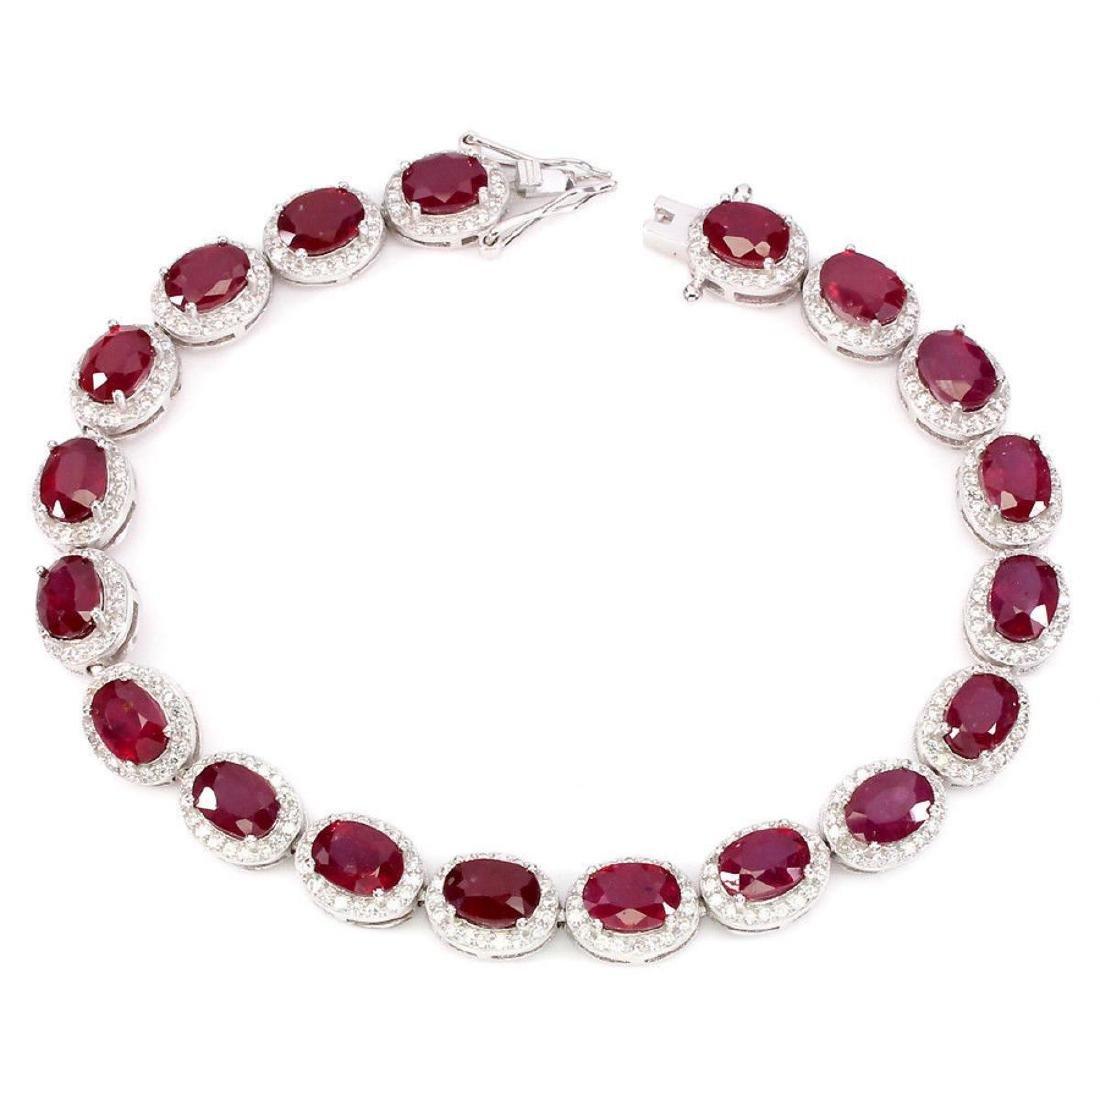 Natural Oval 7x5 Mm Blood Red Ruby Bracelet - 2